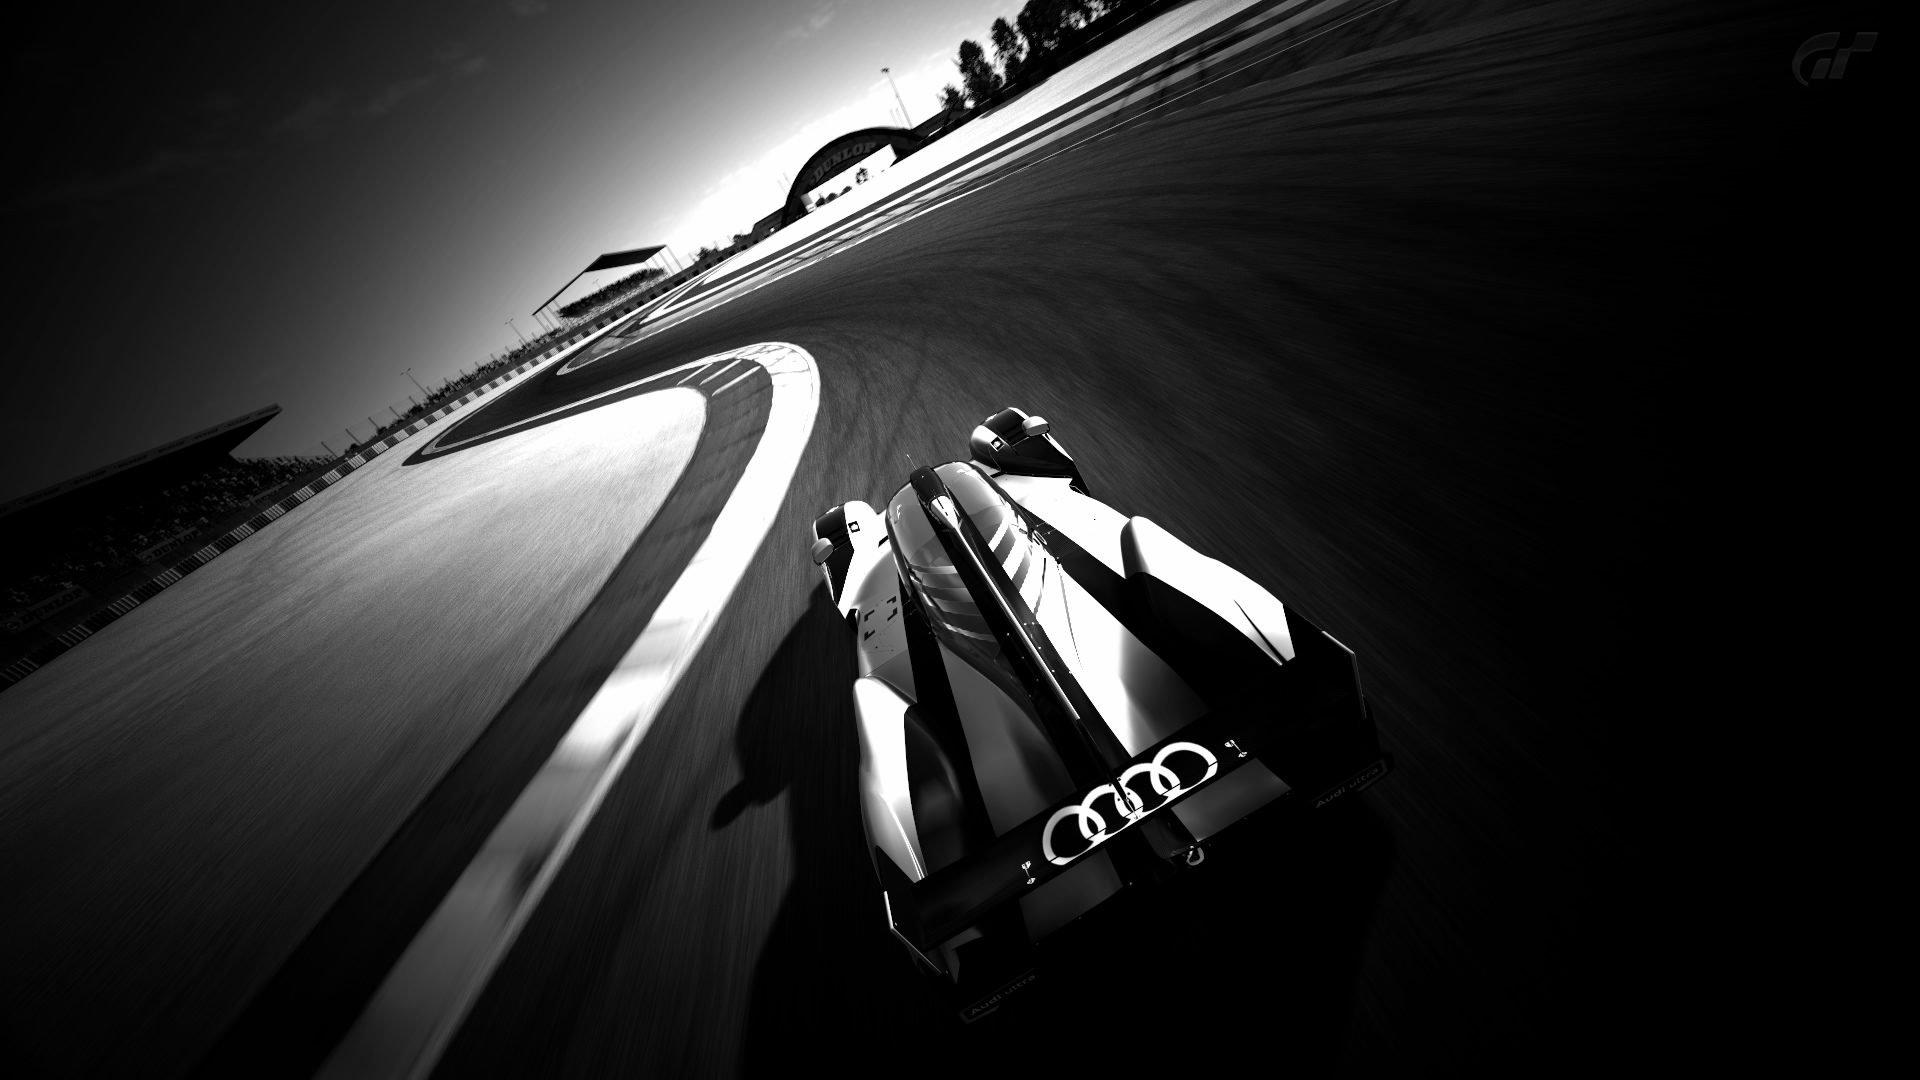 Circuit de la Sarthe 2009_12.jpg